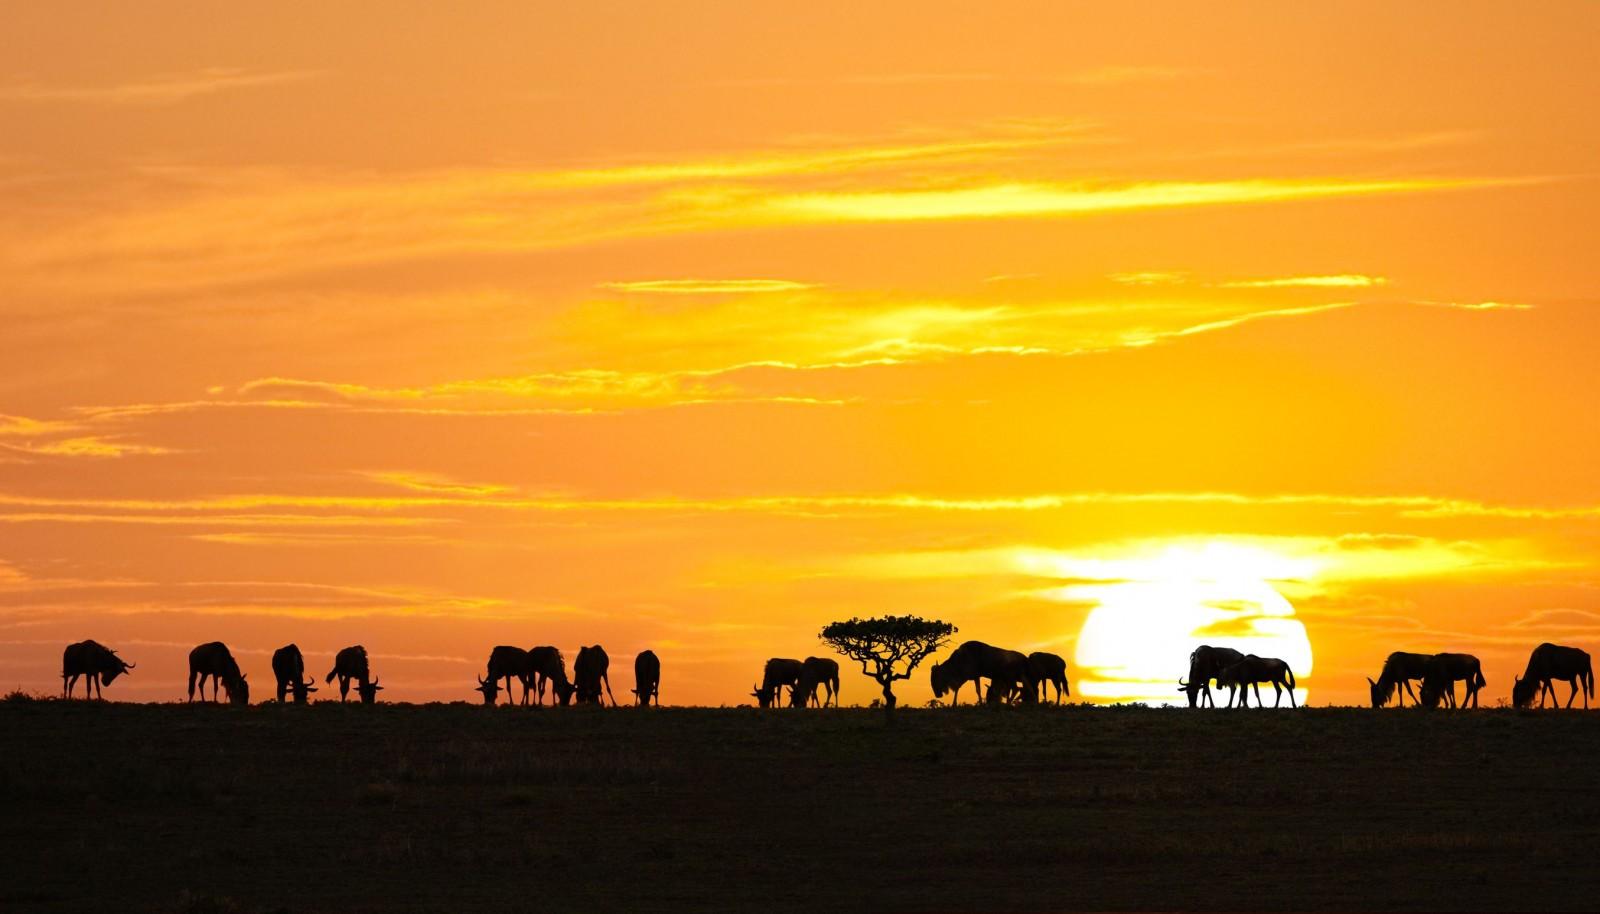 Wildebeests shadows, Serengeti National Park, Tanzania